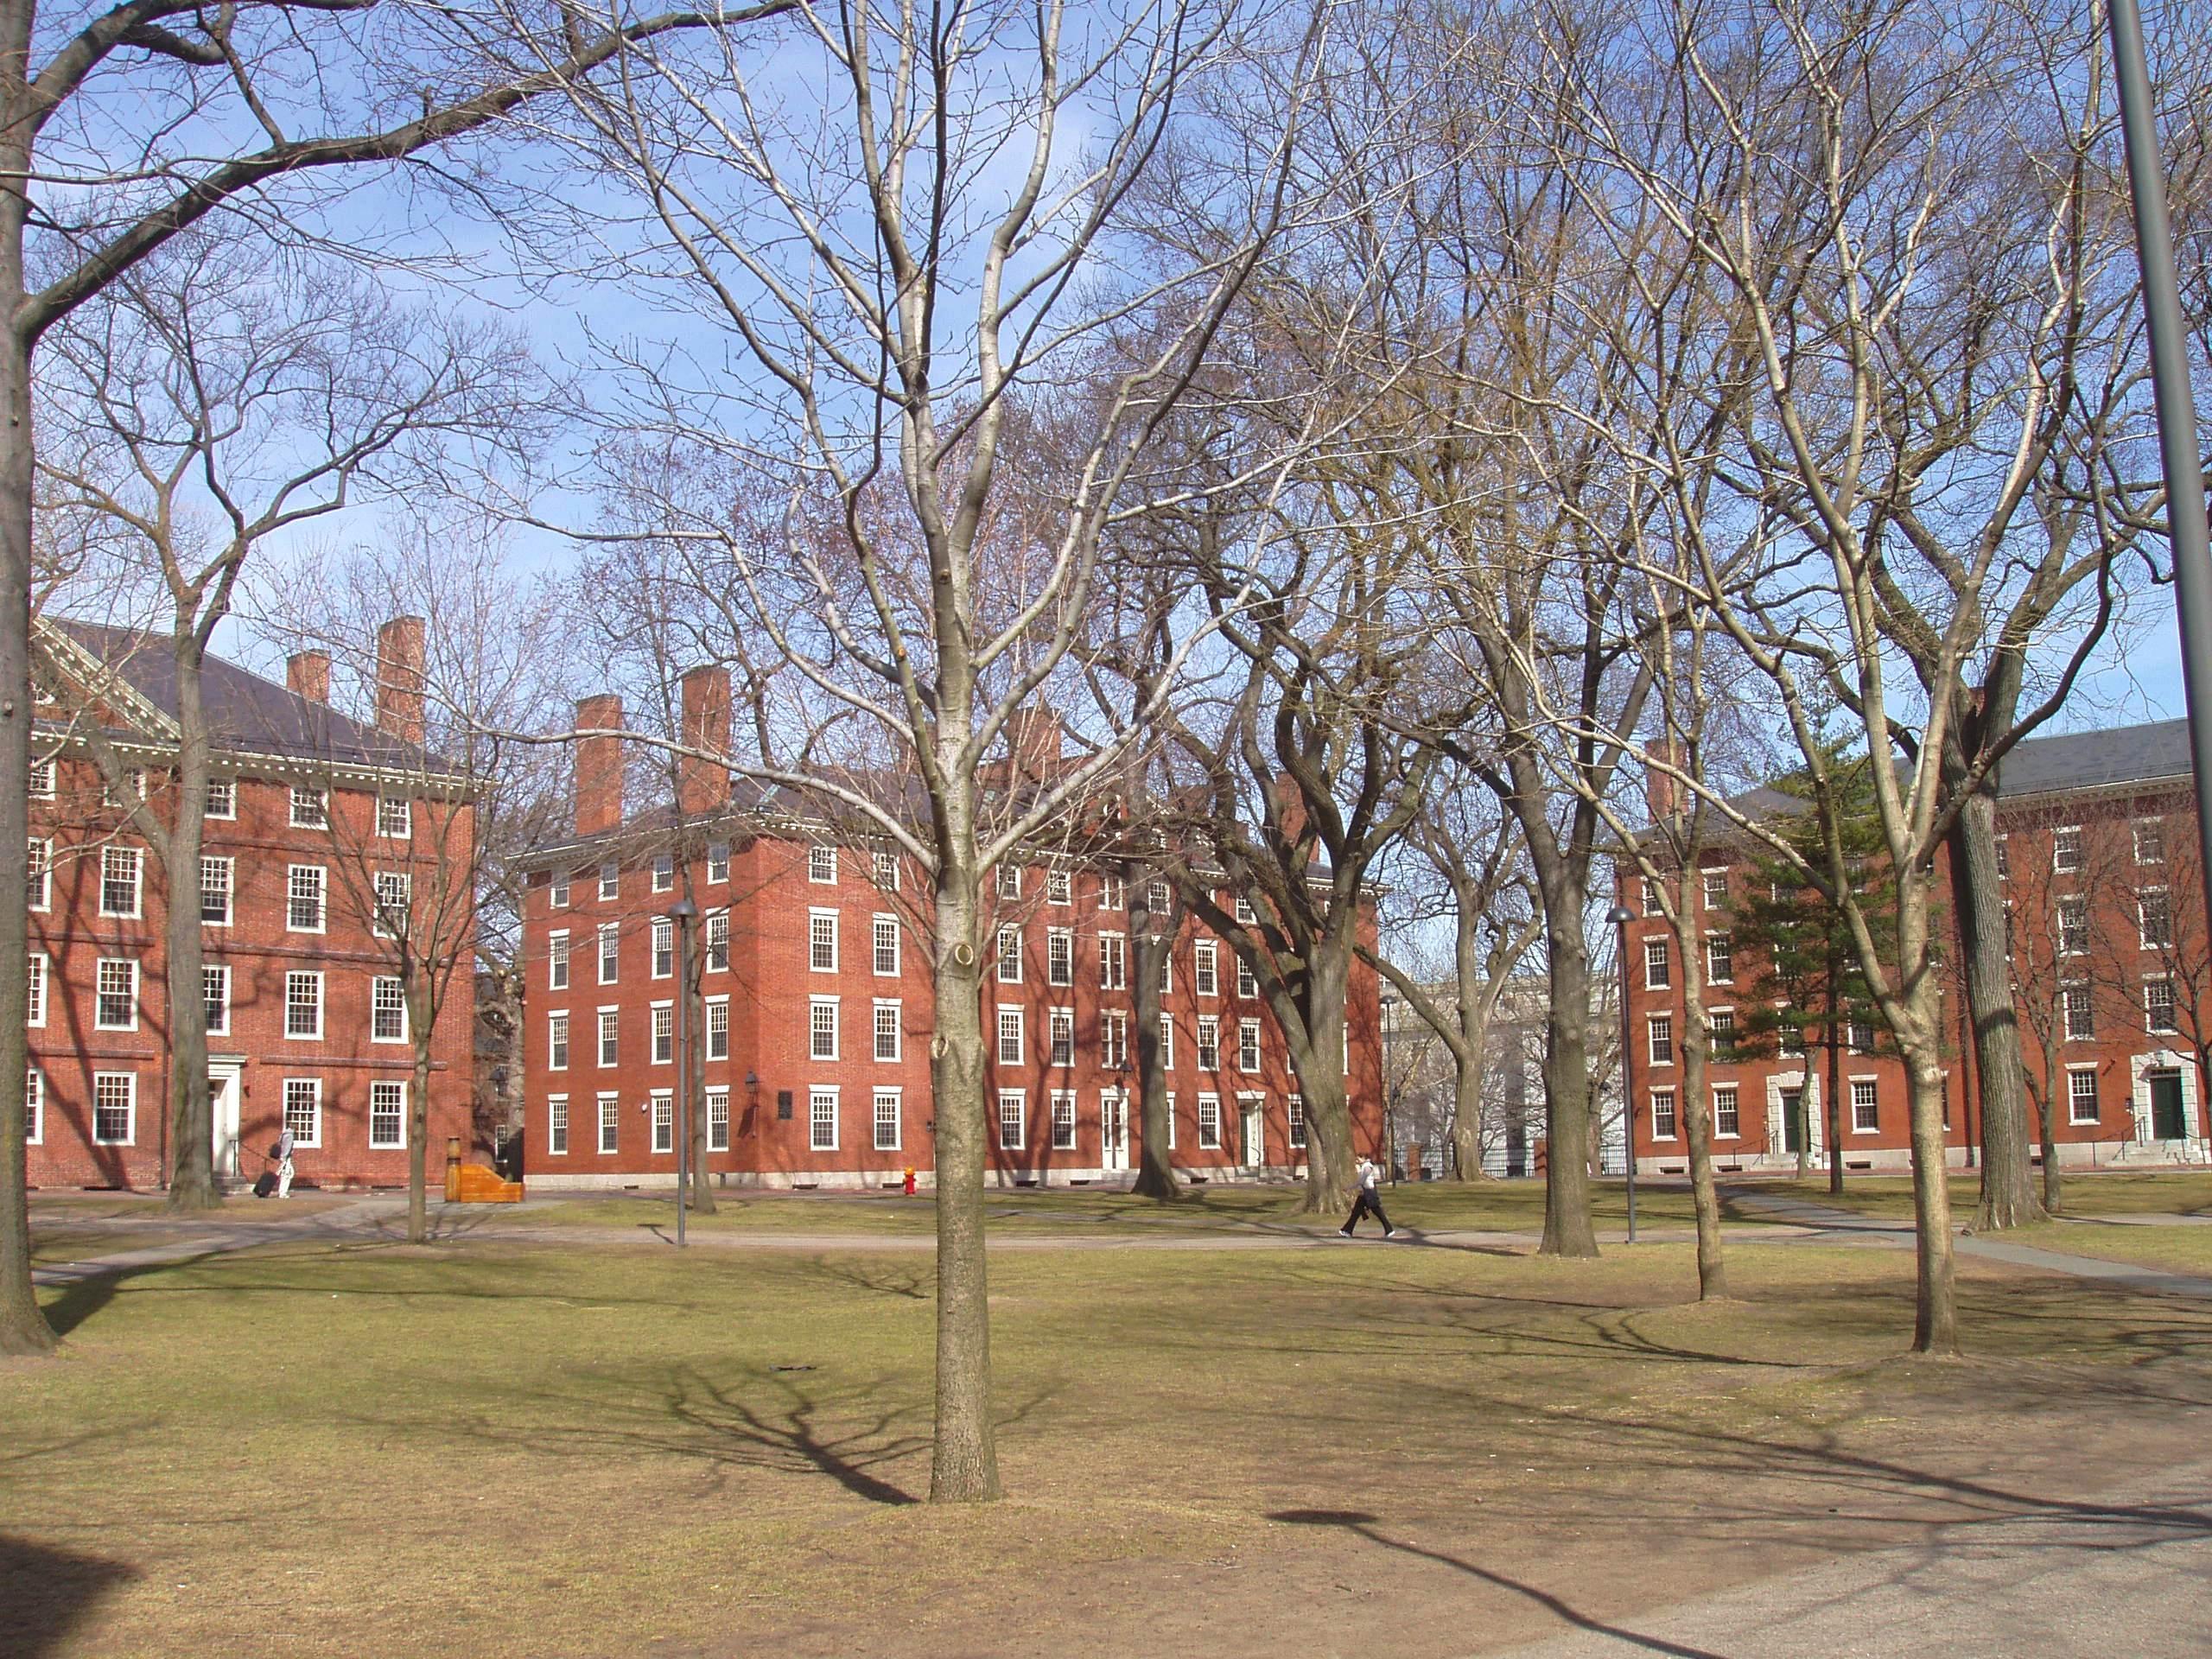 Harvard_Yard,_Harvard_University